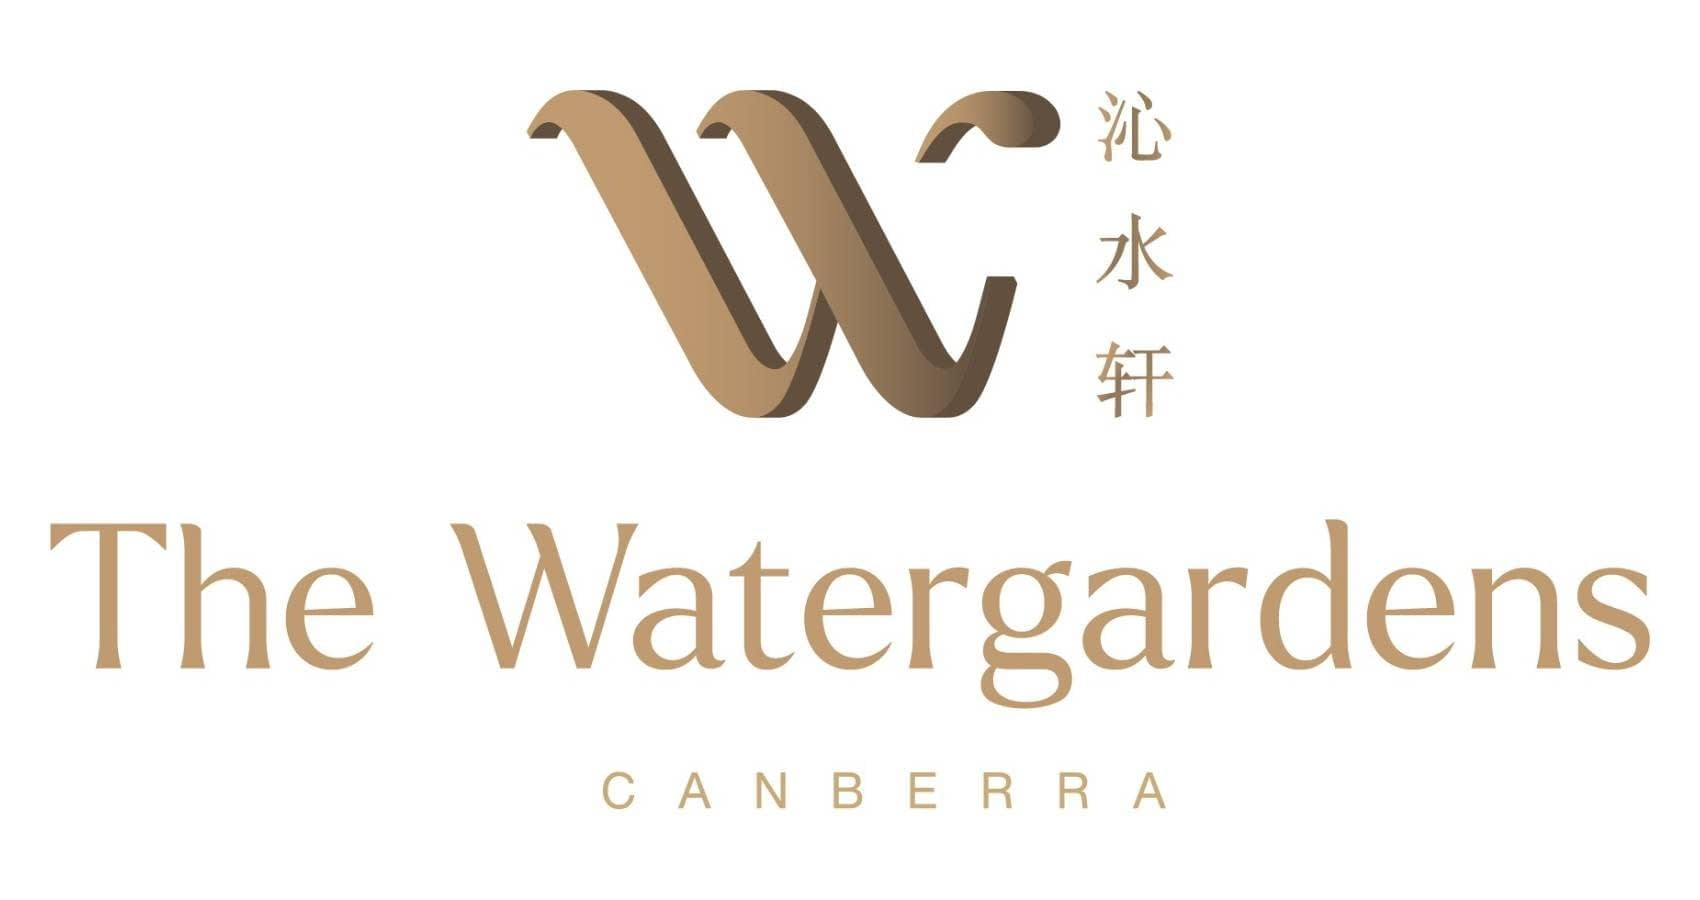 The Watergardens Watergardens logo